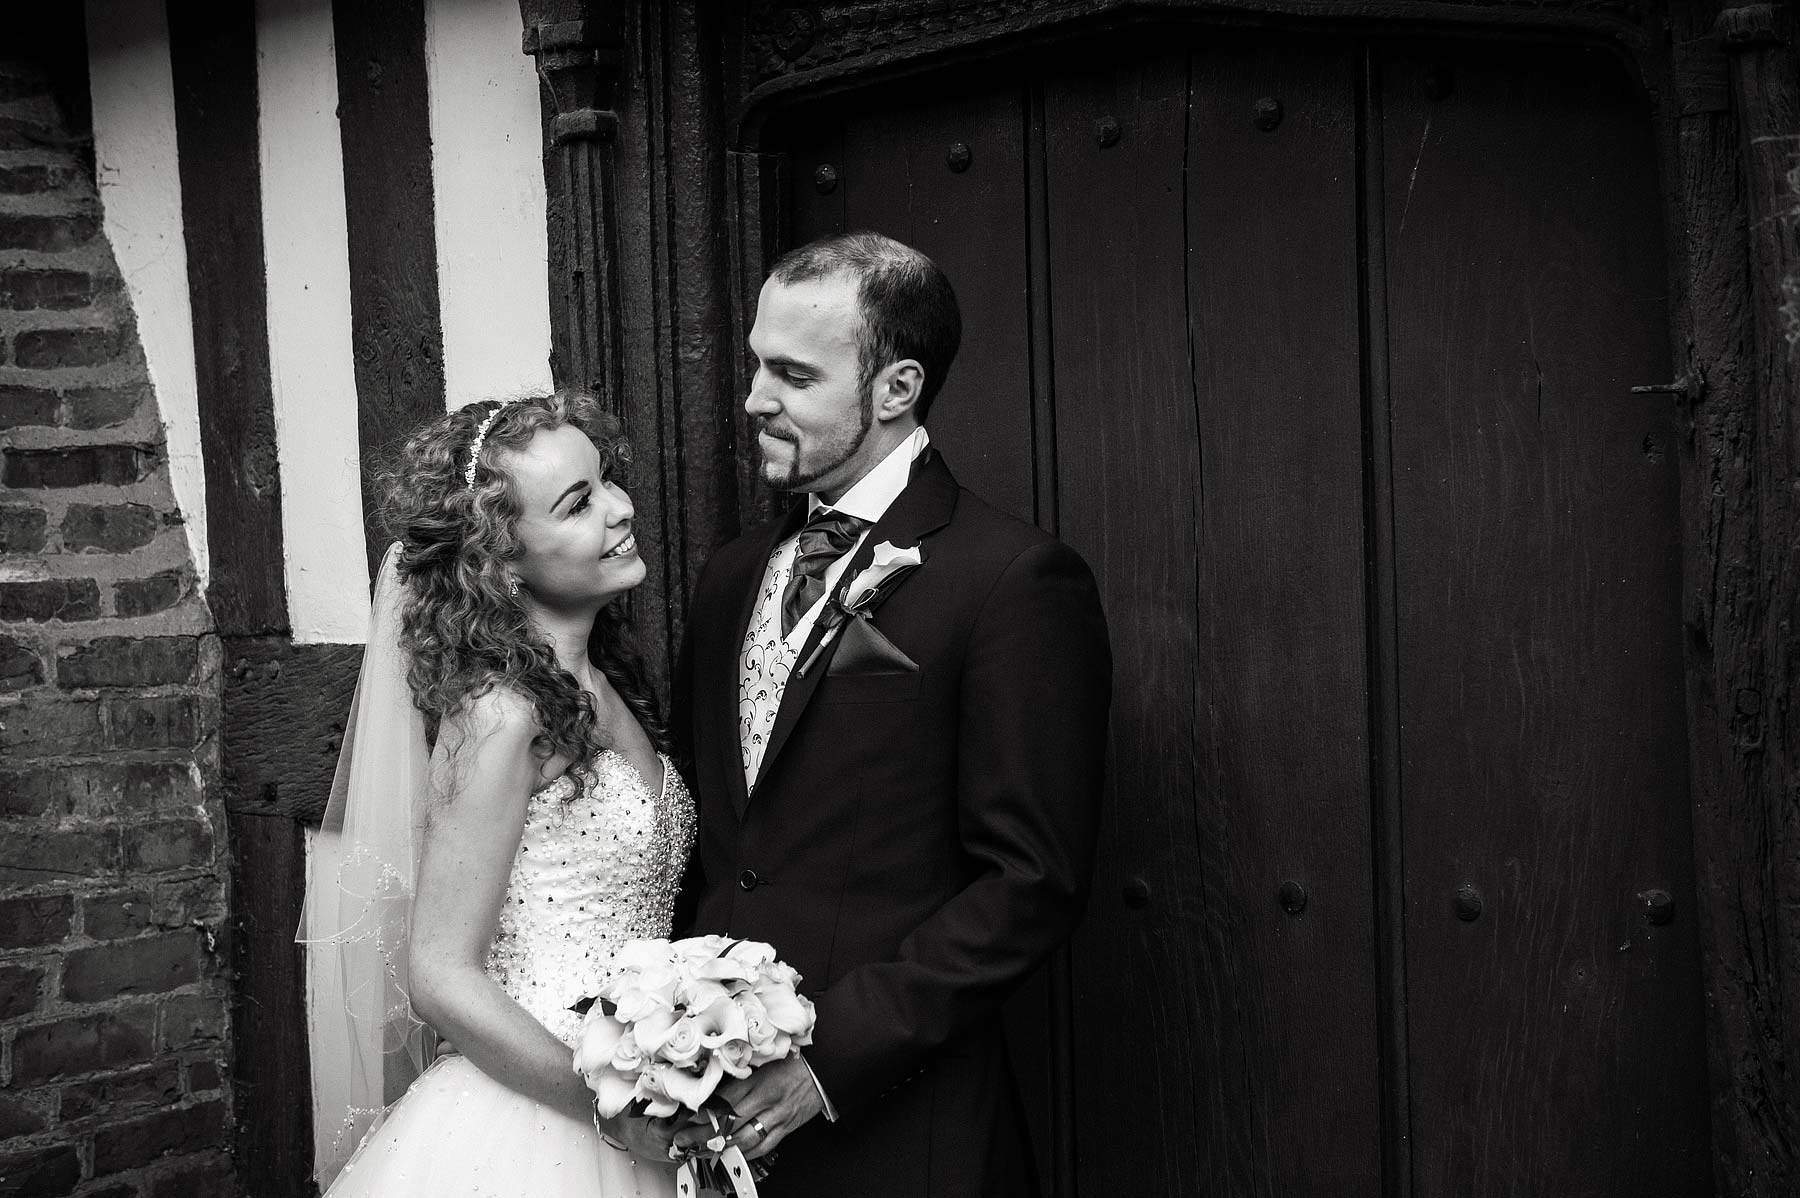 albright-hussey-manor-wedding-photographers-042